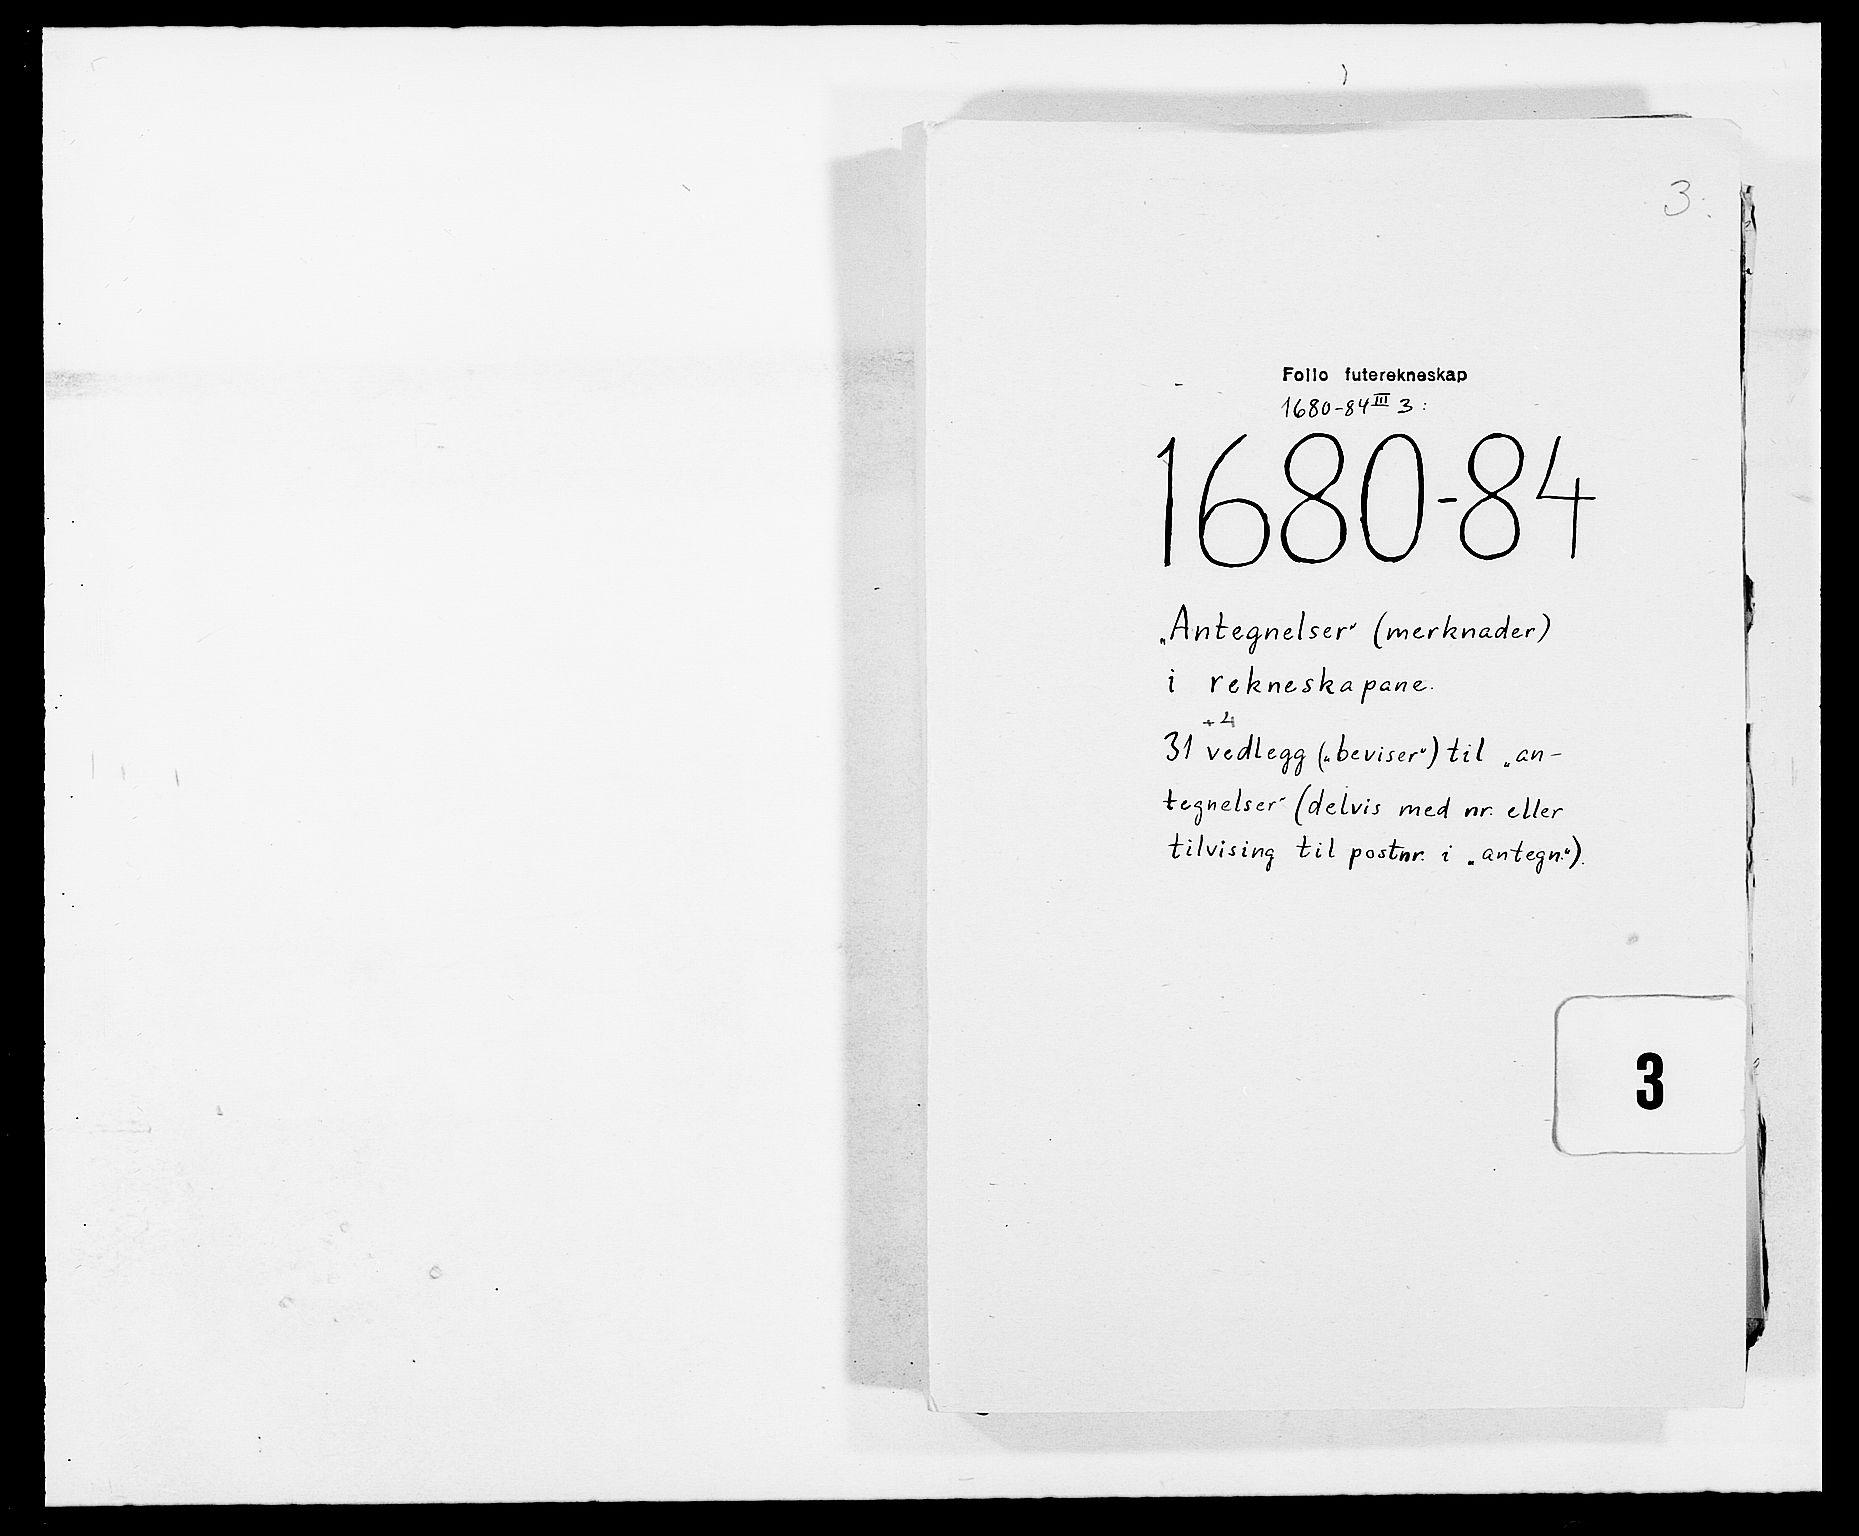 RA, Rentekammeret inntil 1814, Reviderte regnskaper, Fogderegnskap, R09/L0432: Fogderegnskap Follo, 1680-1684, s. 152